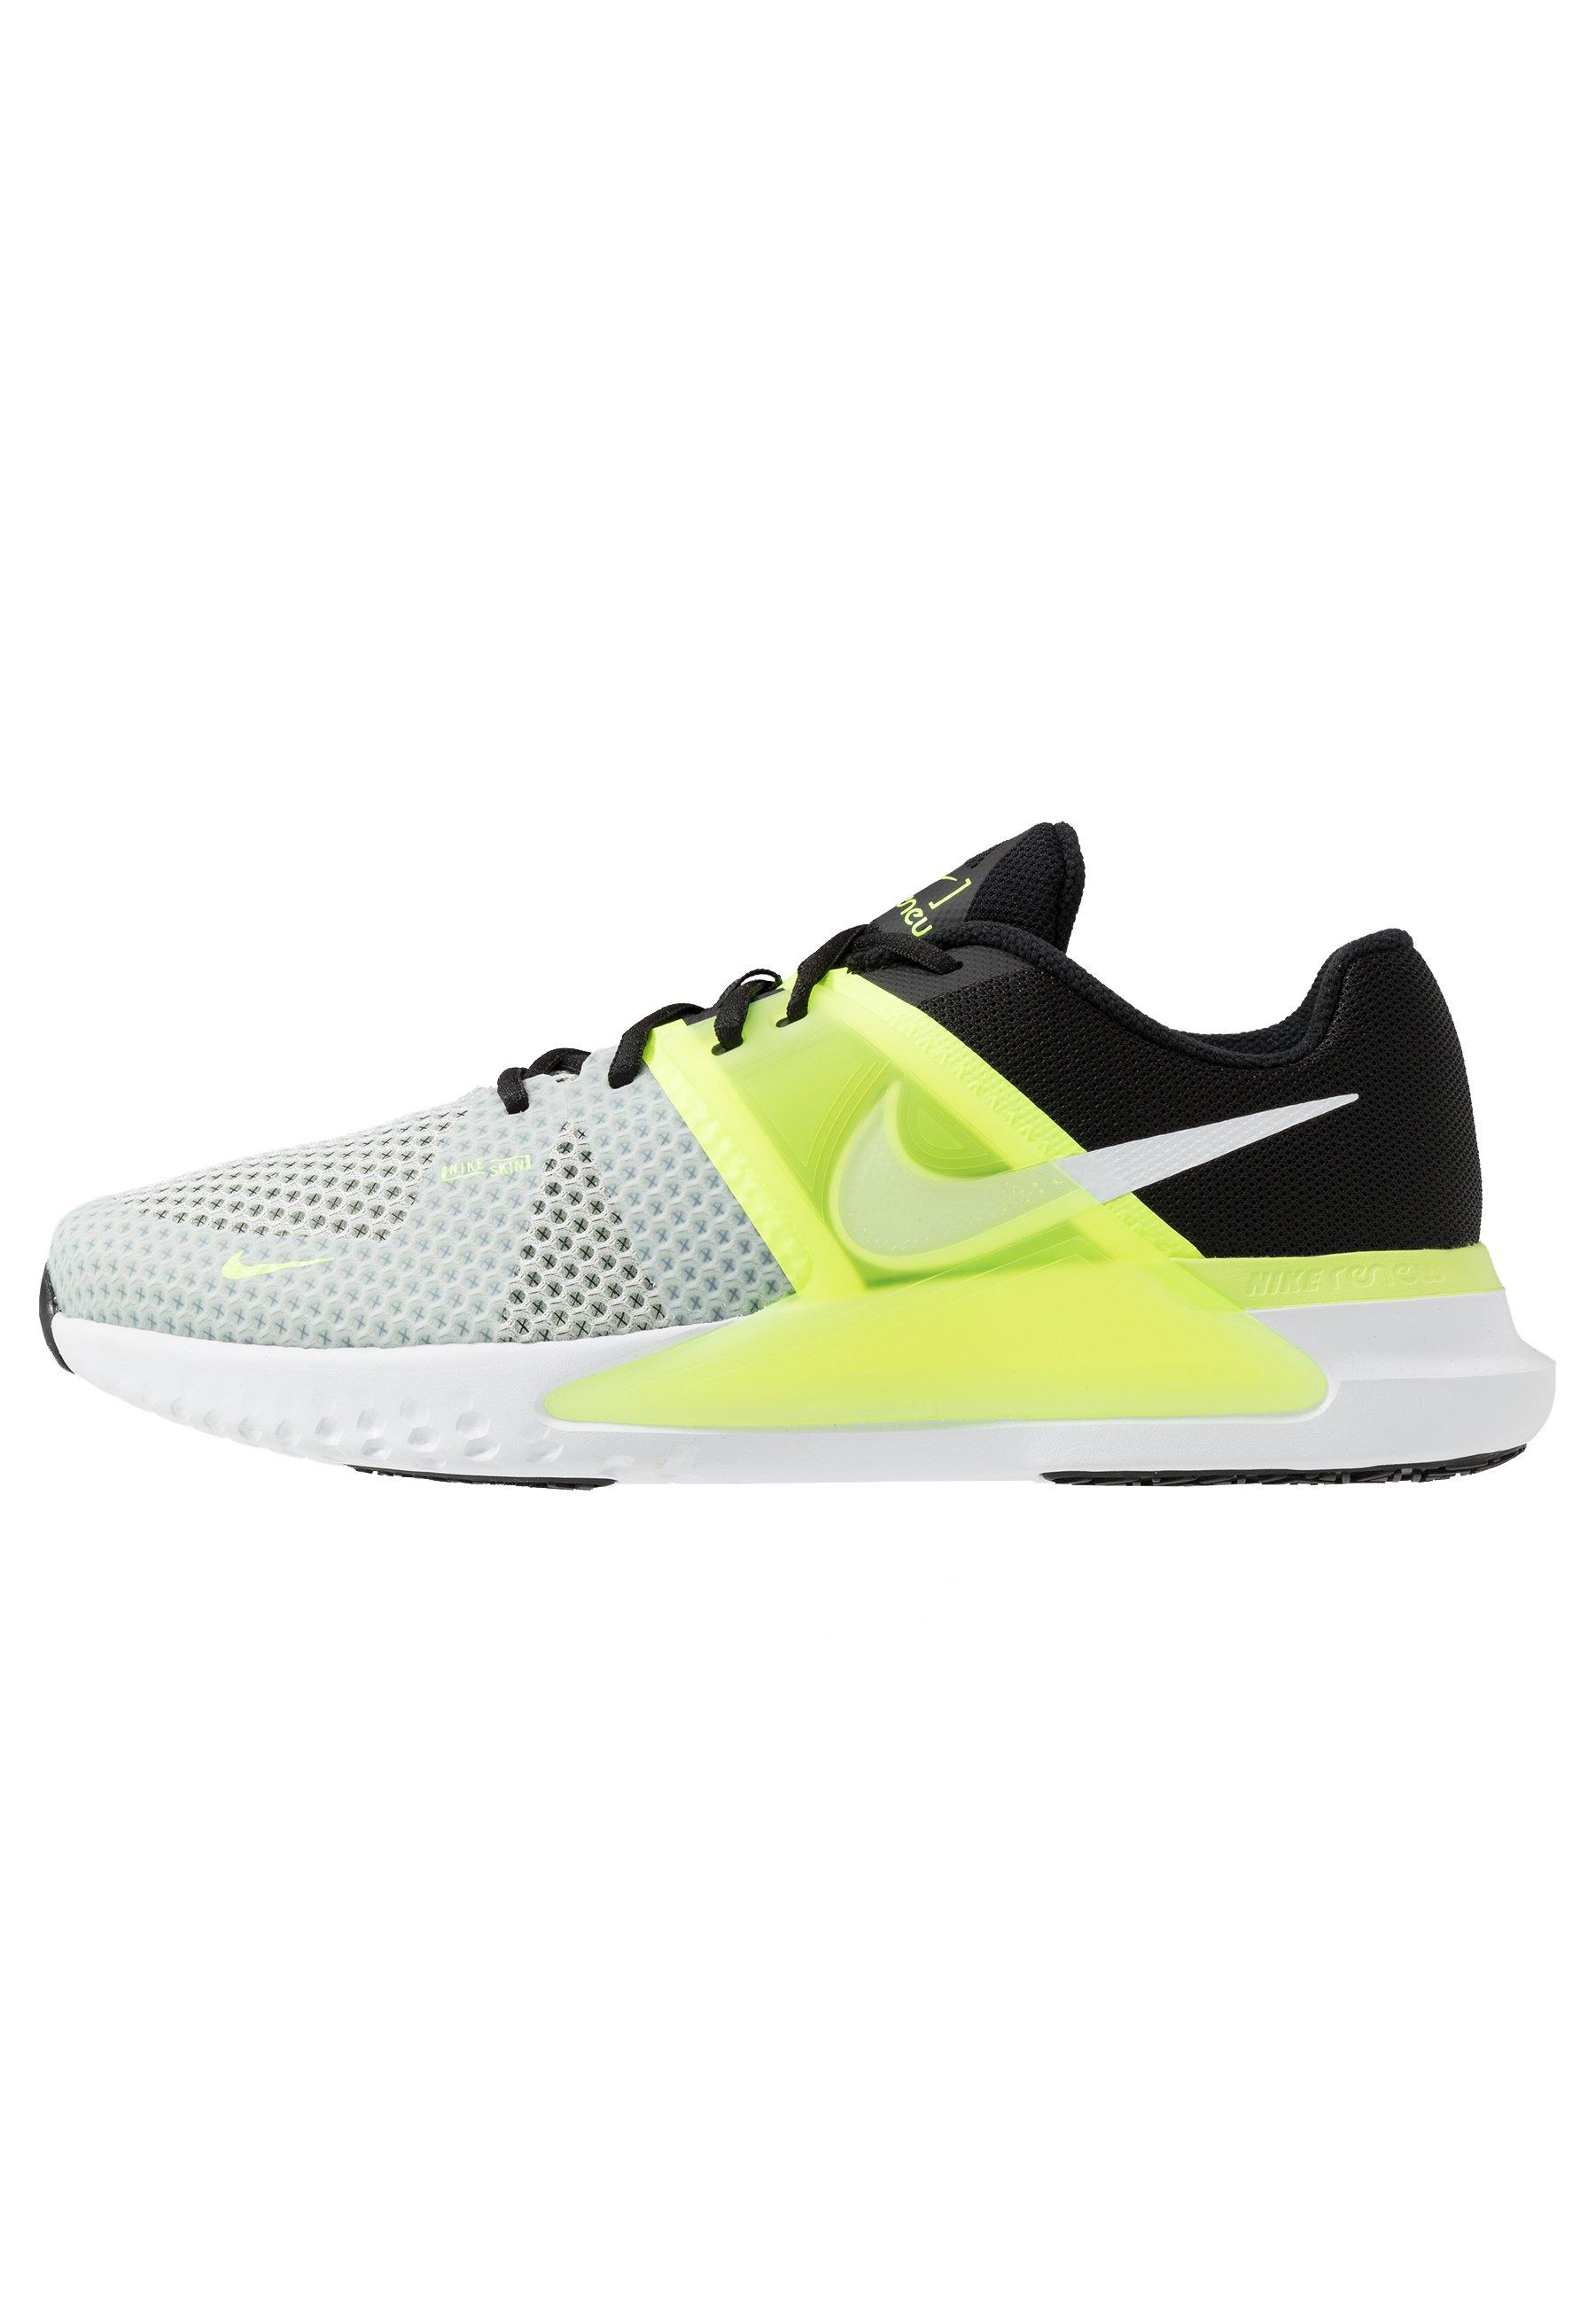 Rebajas en moda Nike para hombre | Catálogo online en Zalando